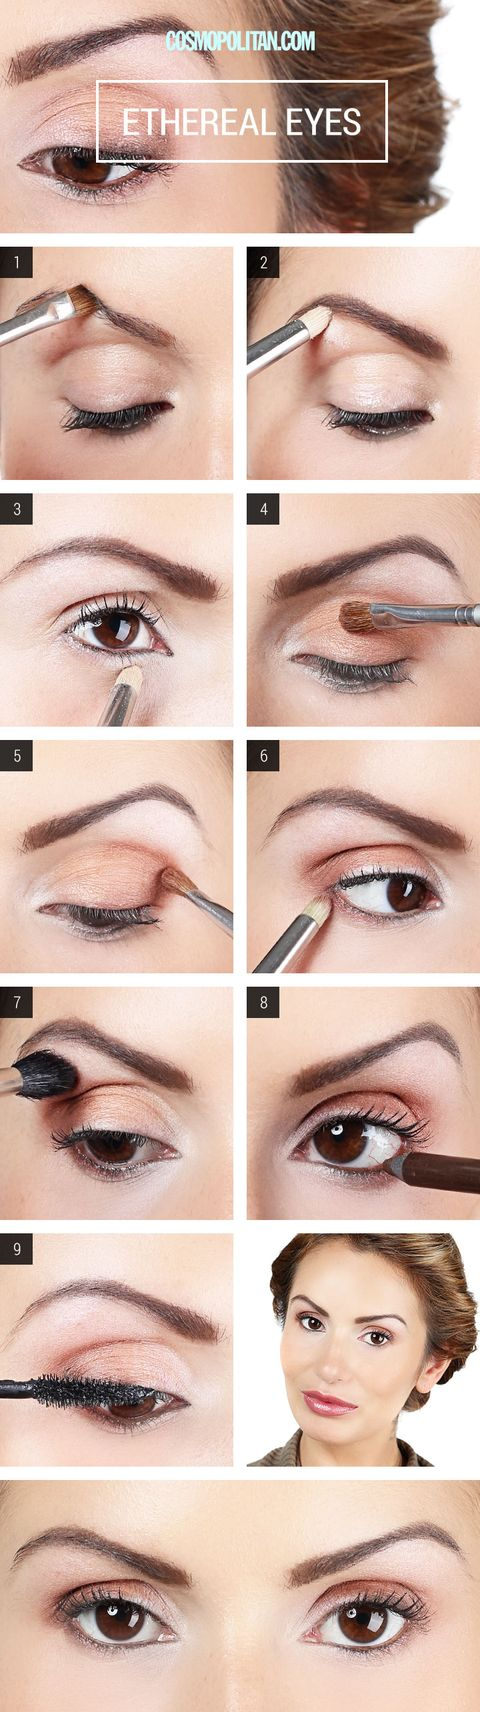 Makeup How To Apply Champagne Eyeshadow Eye Makeup Tutorial